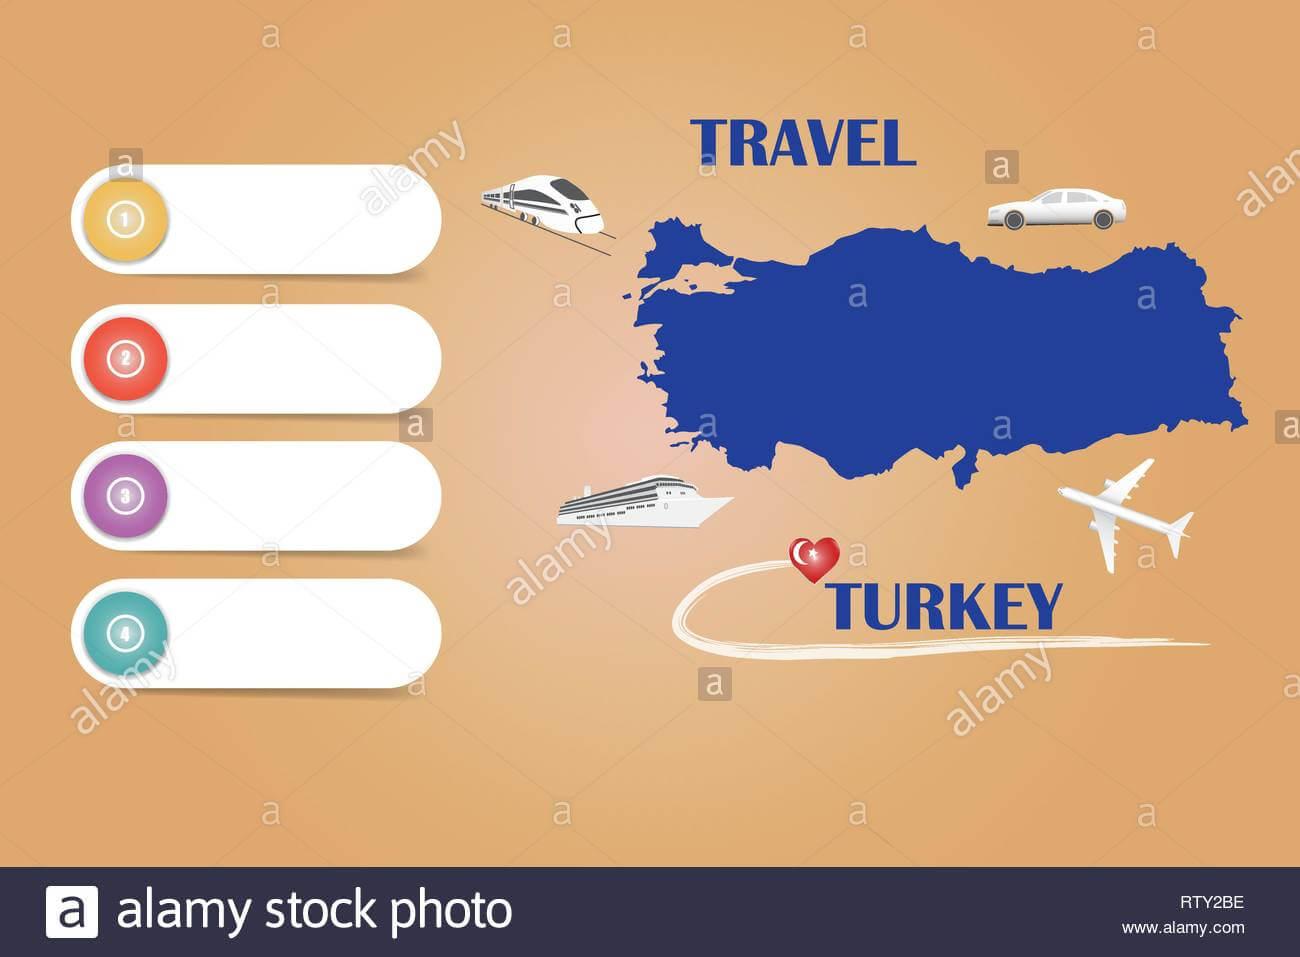 Travel Turkey Template Vector For Travel Agencies Etc Regarding Blank Turkey Template